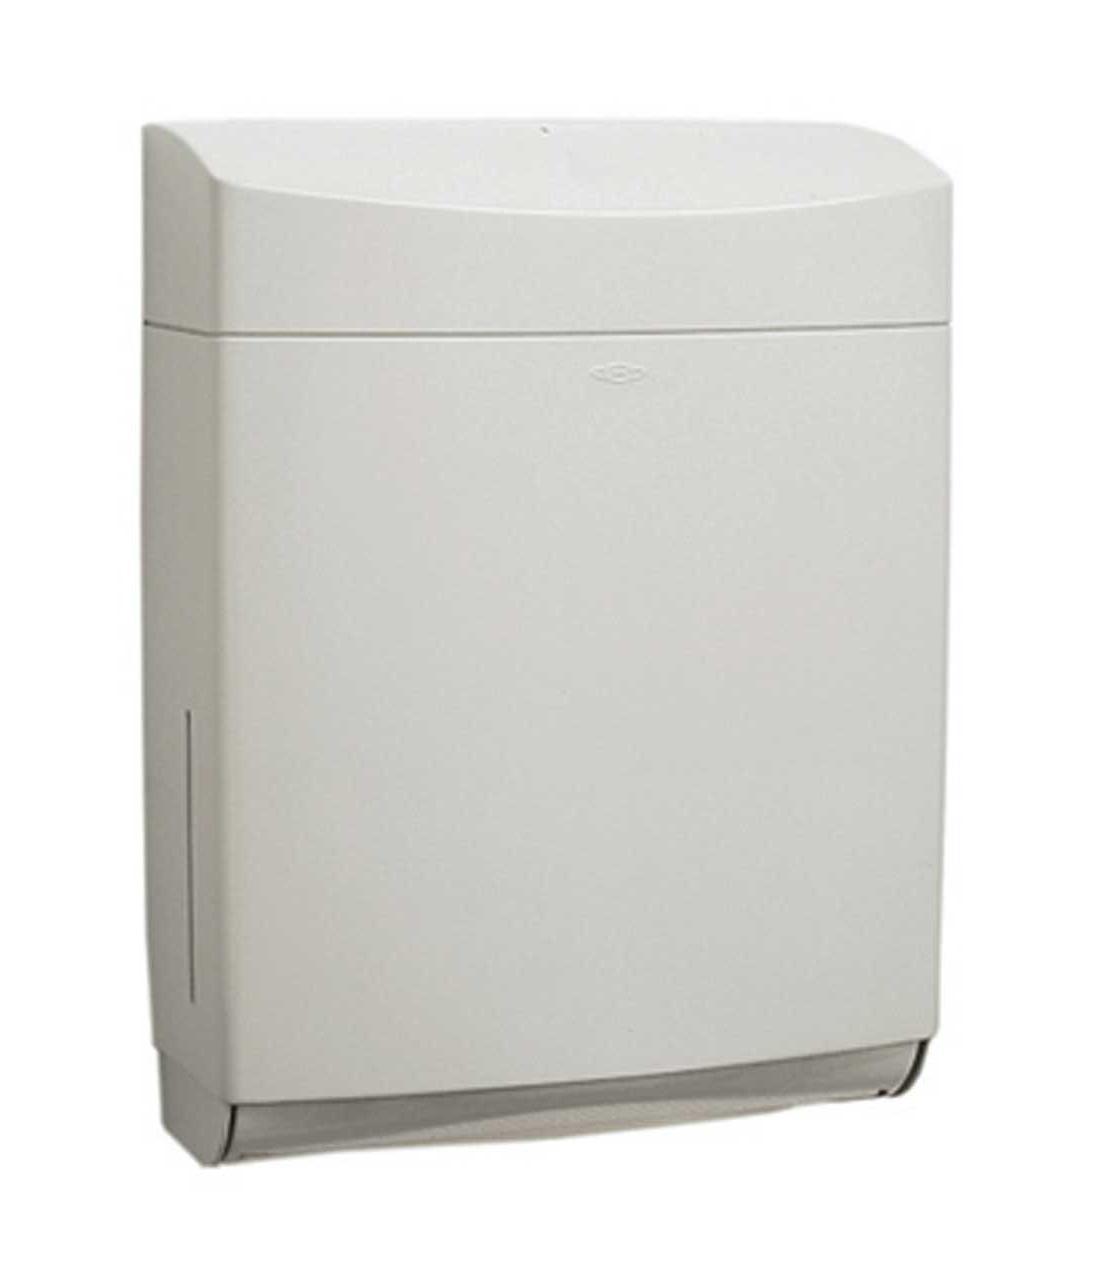 Bobrick B5262 Plastic Paper Towel Dispenser Trifold Paper